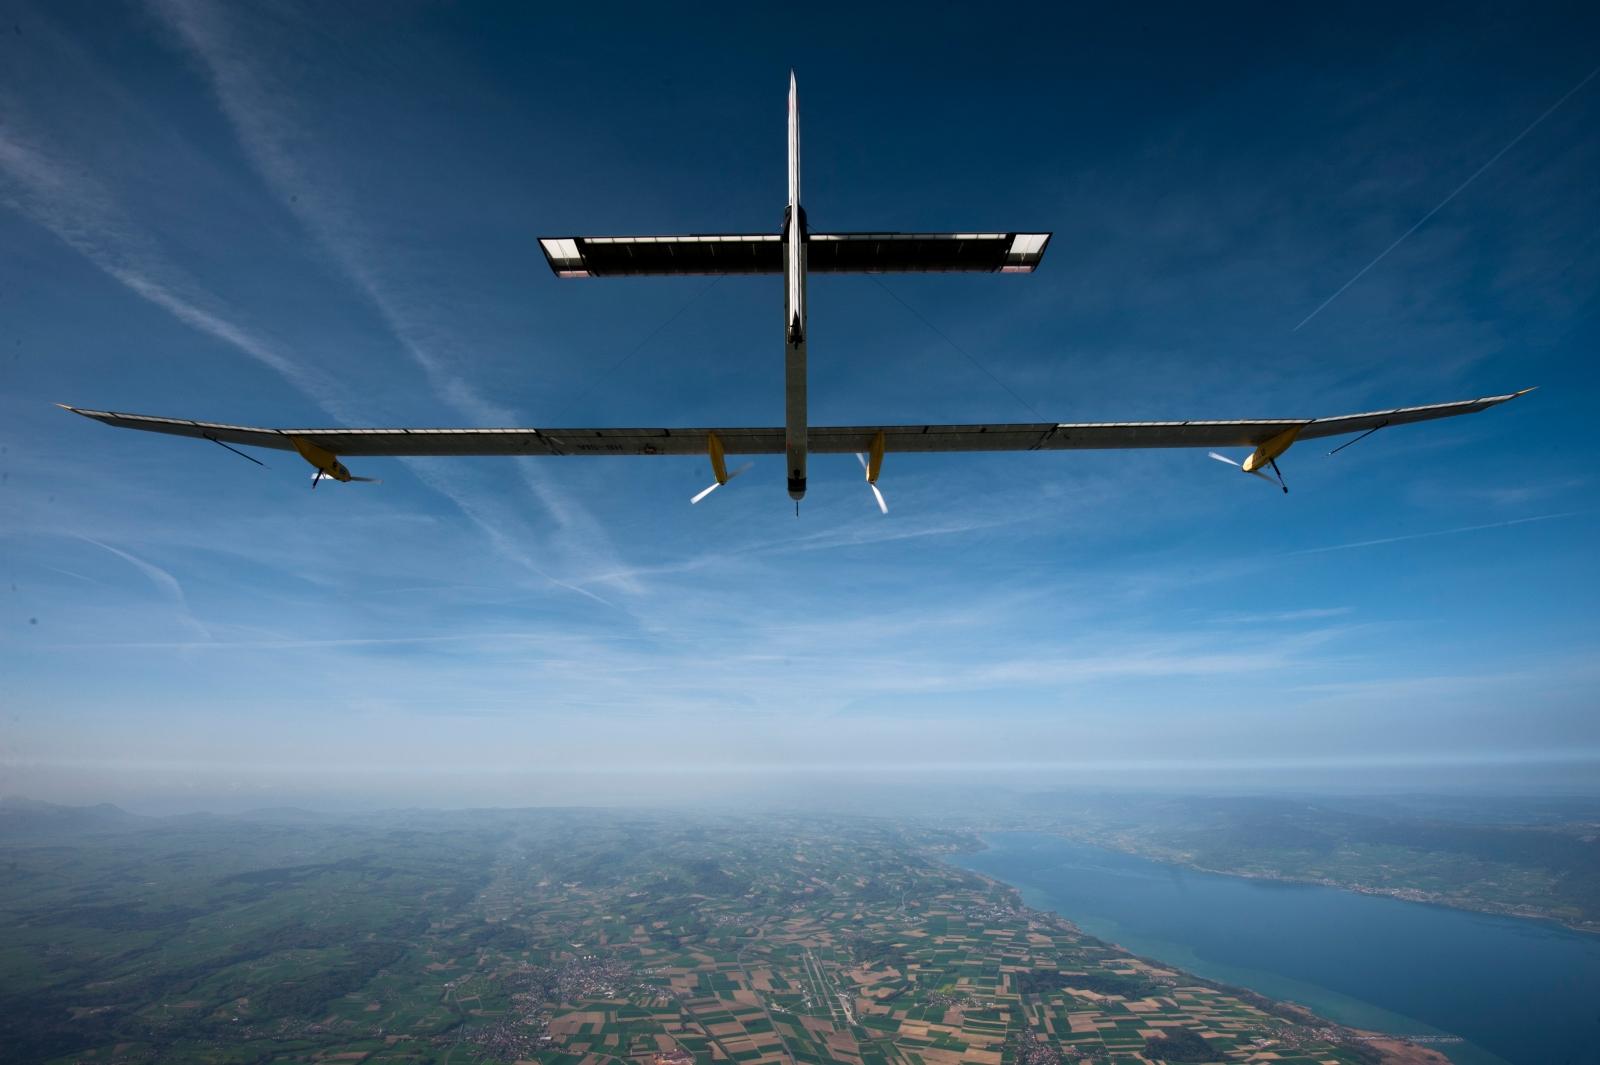 First round-the-world solar flight to take off next month